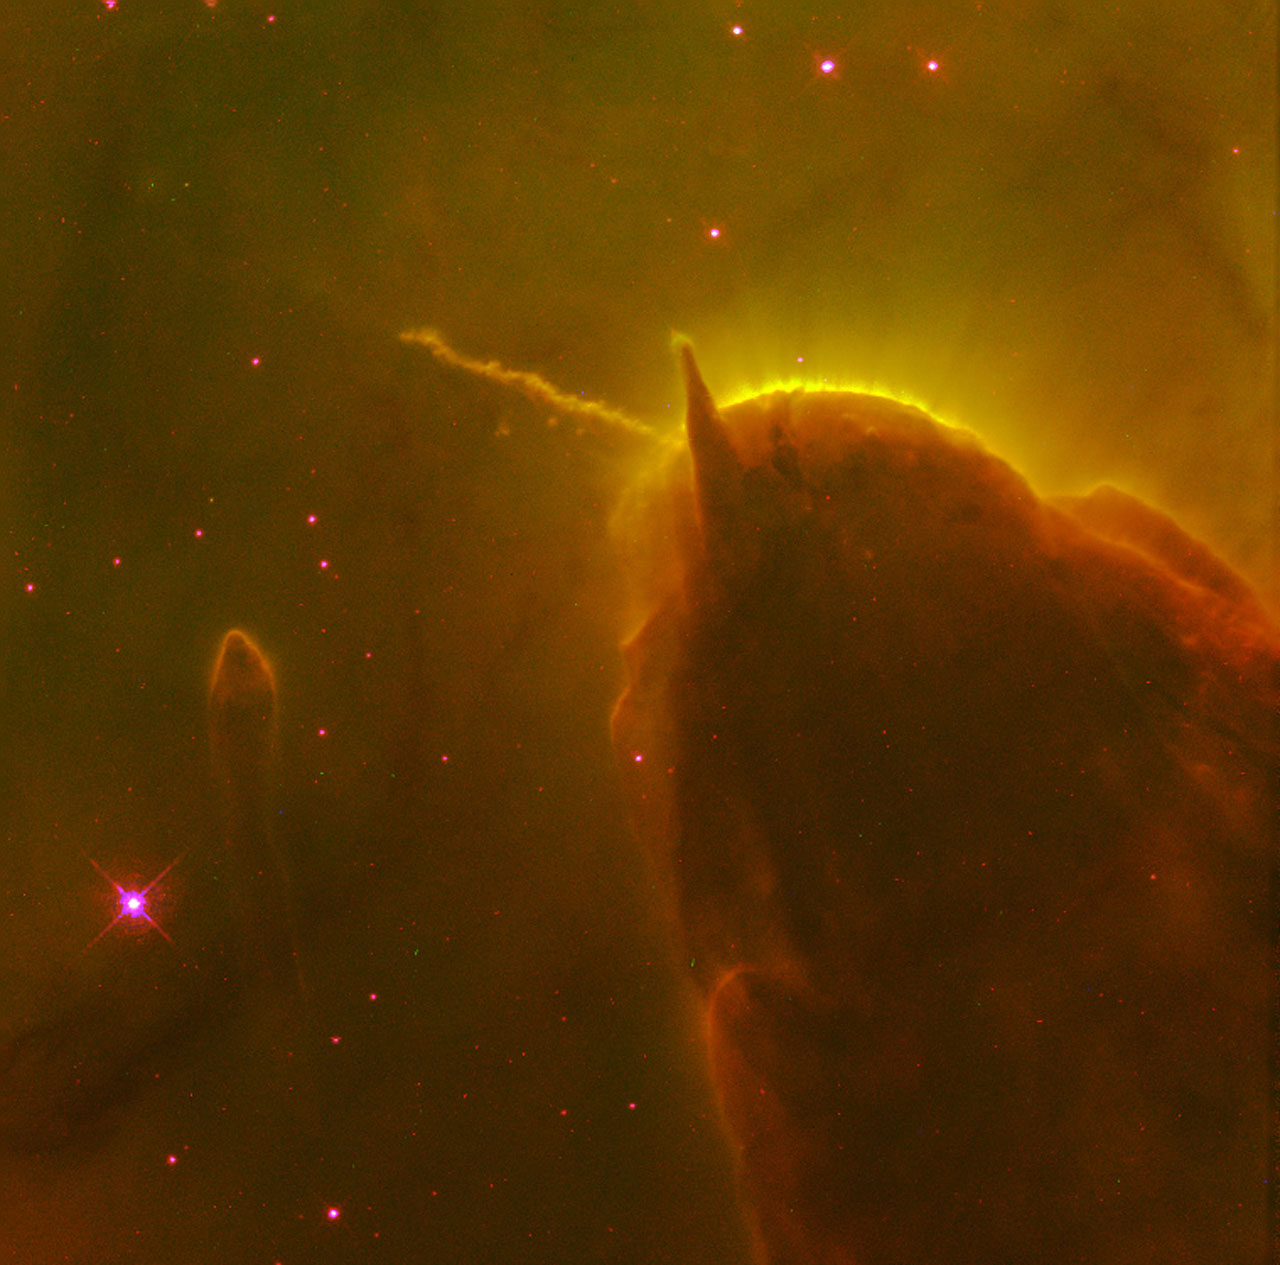 Astronomers capture dazzling rainbow nebula swirling